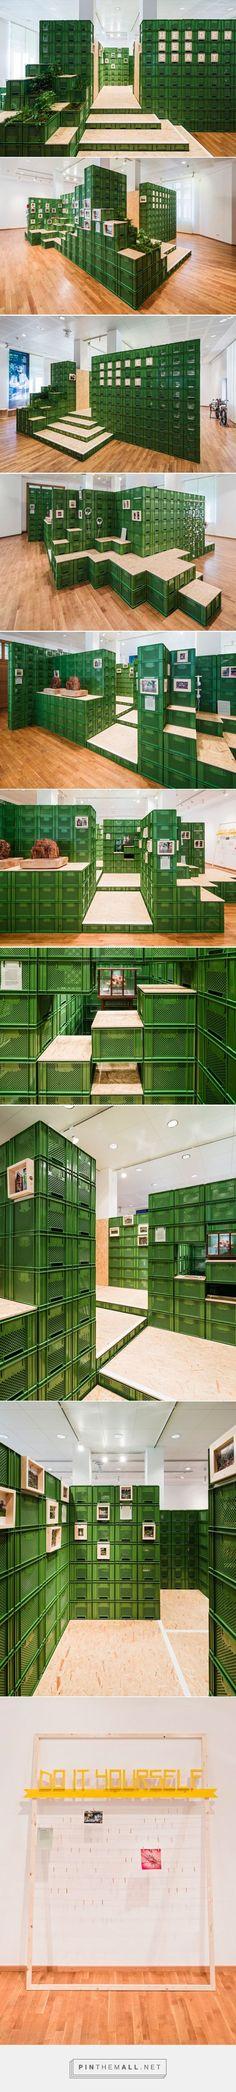 Yalla Yalla!  apila cajas de vegetales para su exposición en Alemania - creado a través de http://pinthemall.net: